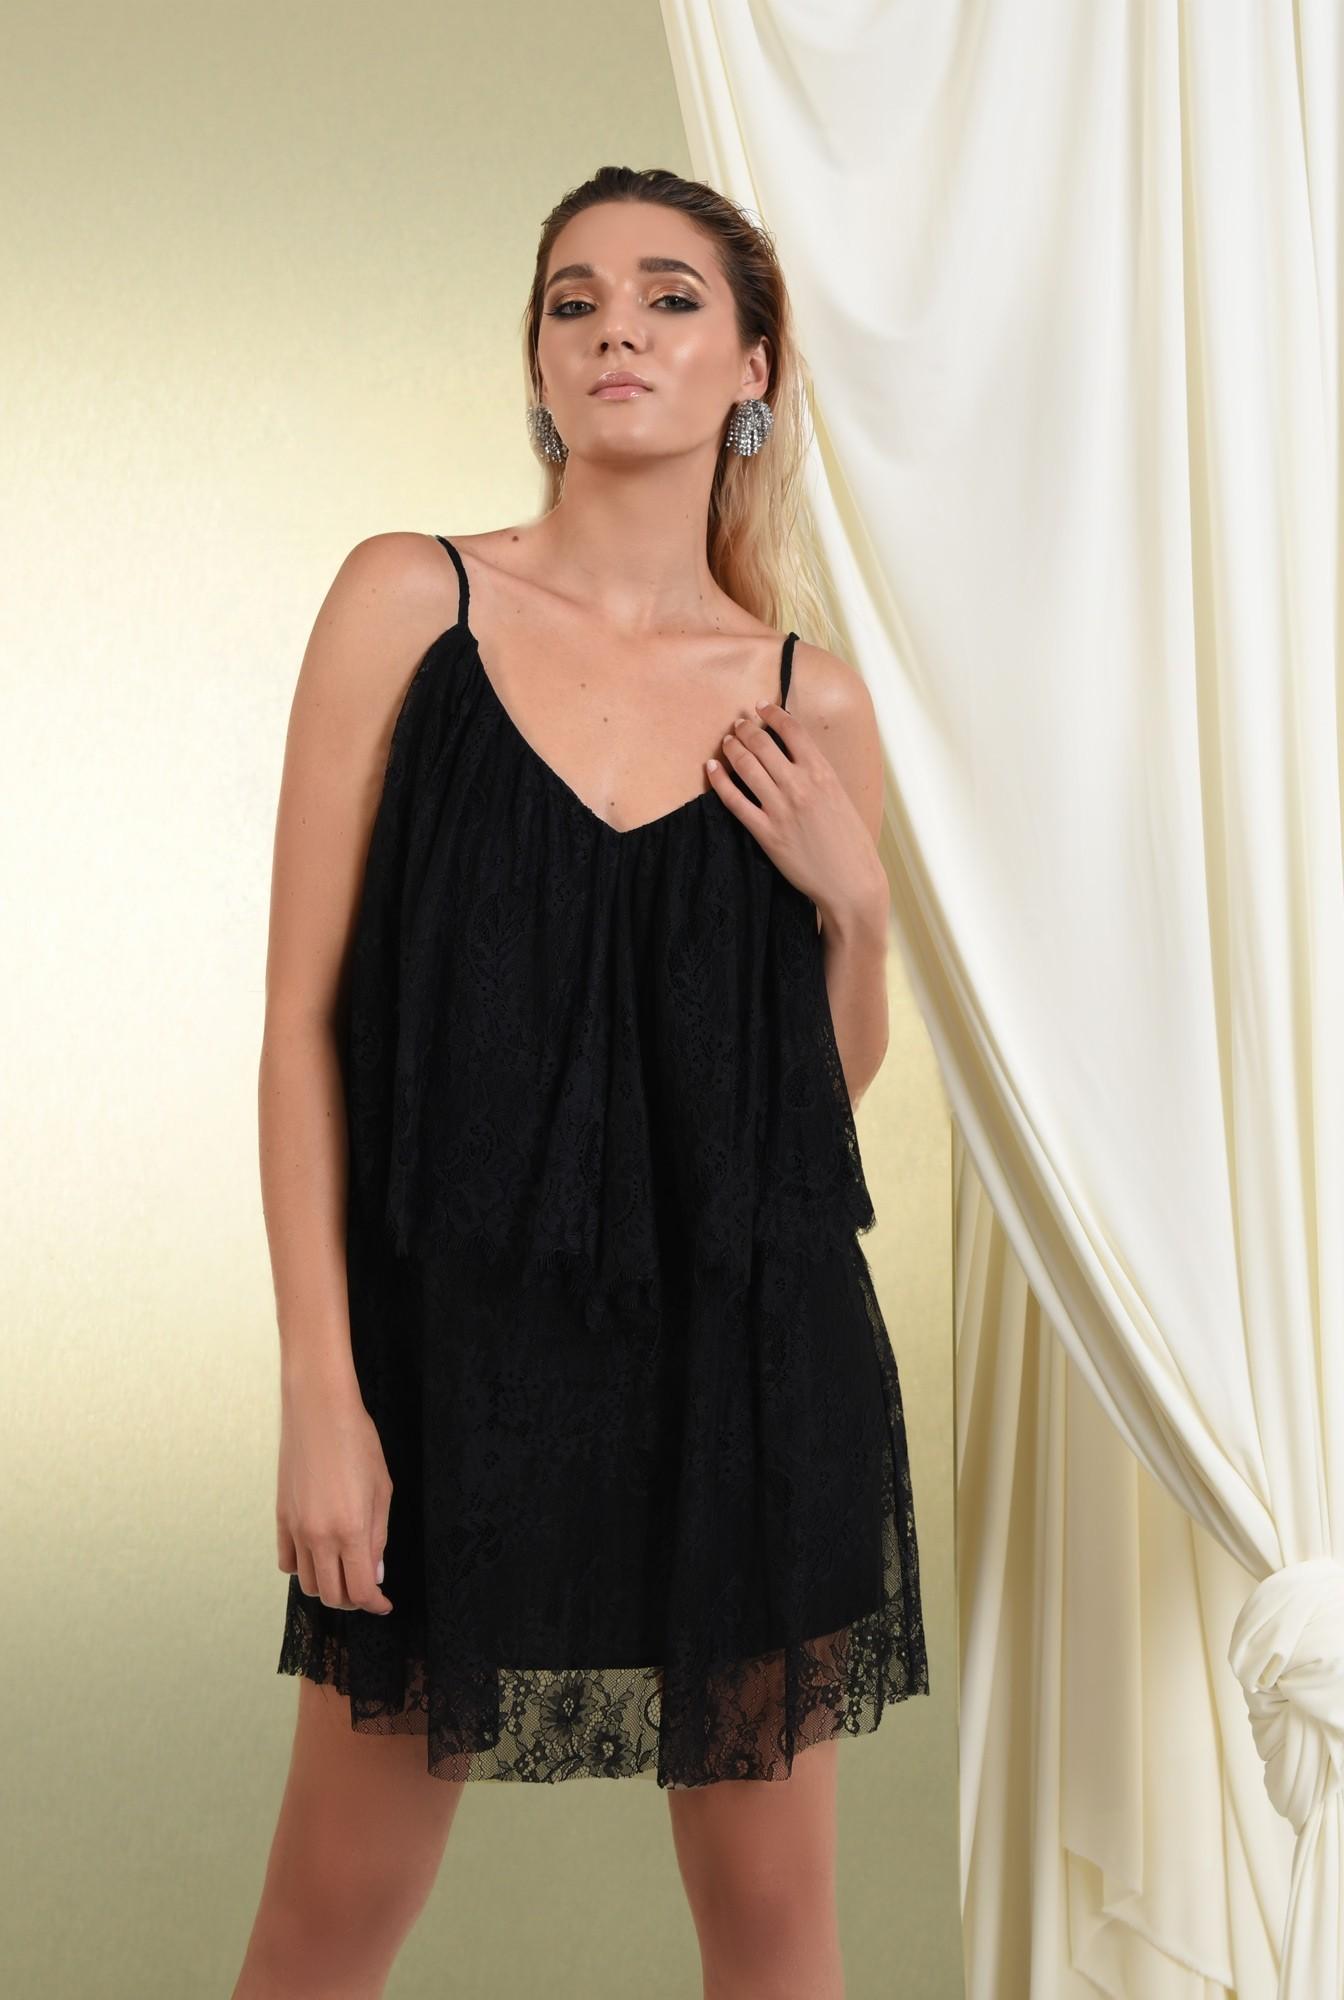 0 - rochie de seara, scurta, din dantela, negru, bretele subtiri